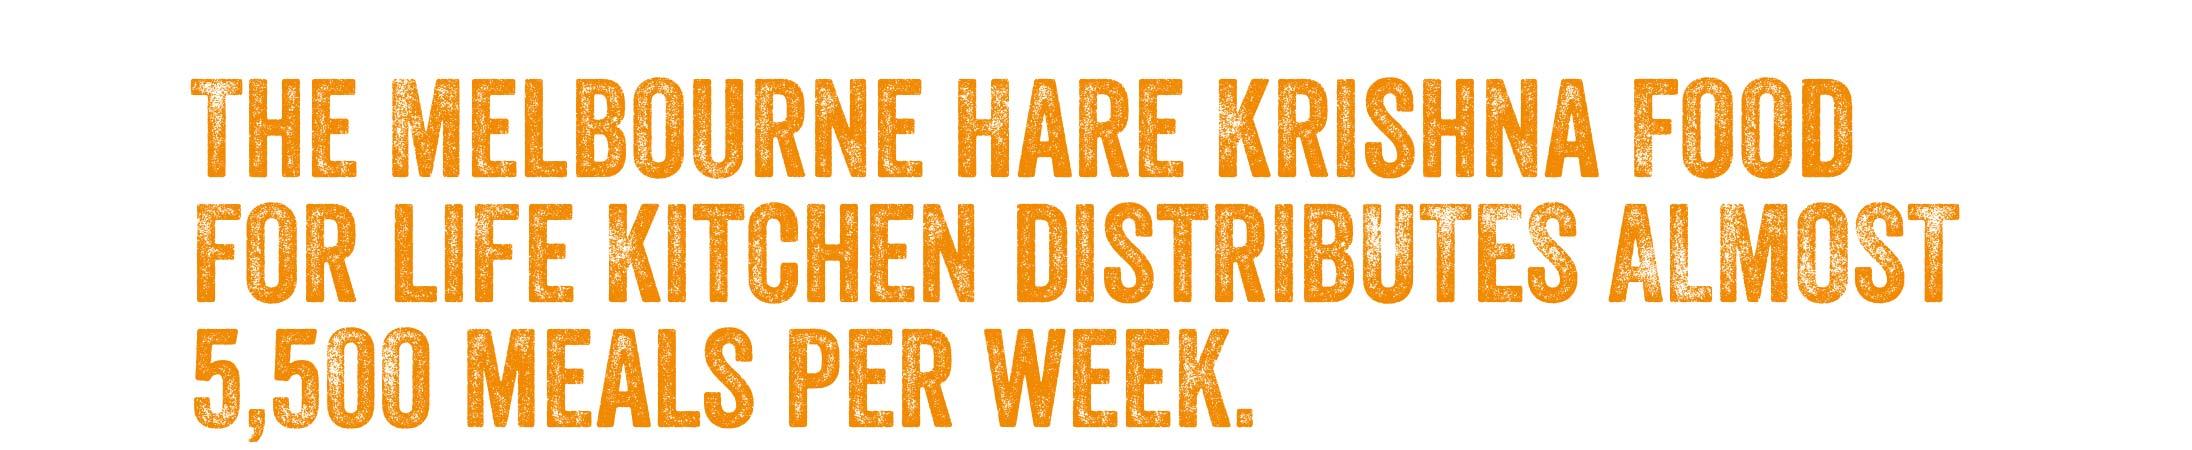 Distributing almost 5, 500 meals per week